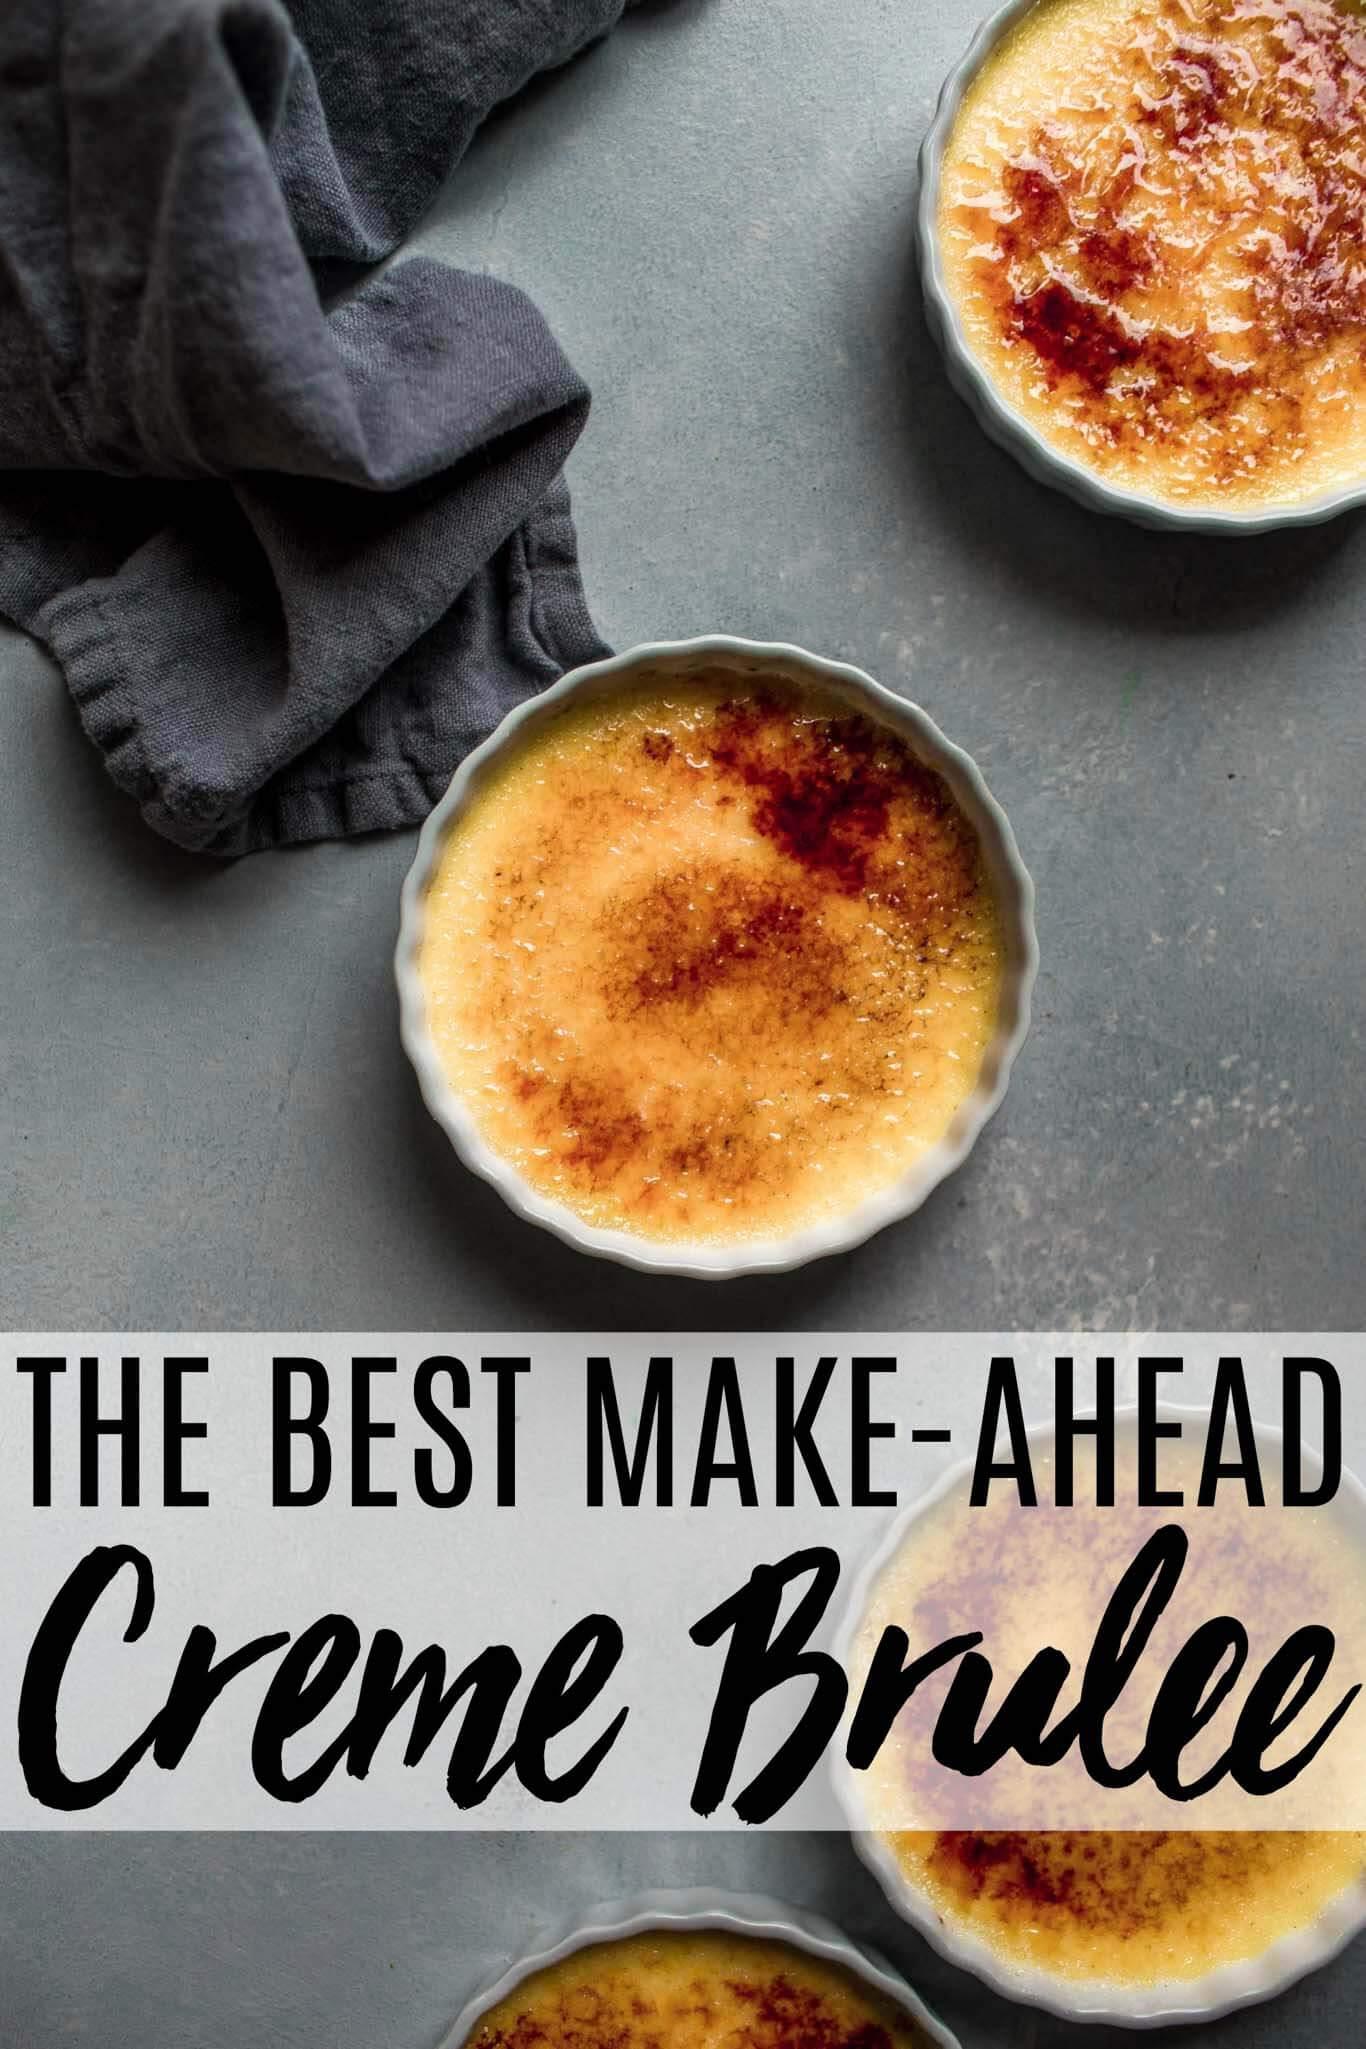 Classic Creme Brulee Platings Pairings